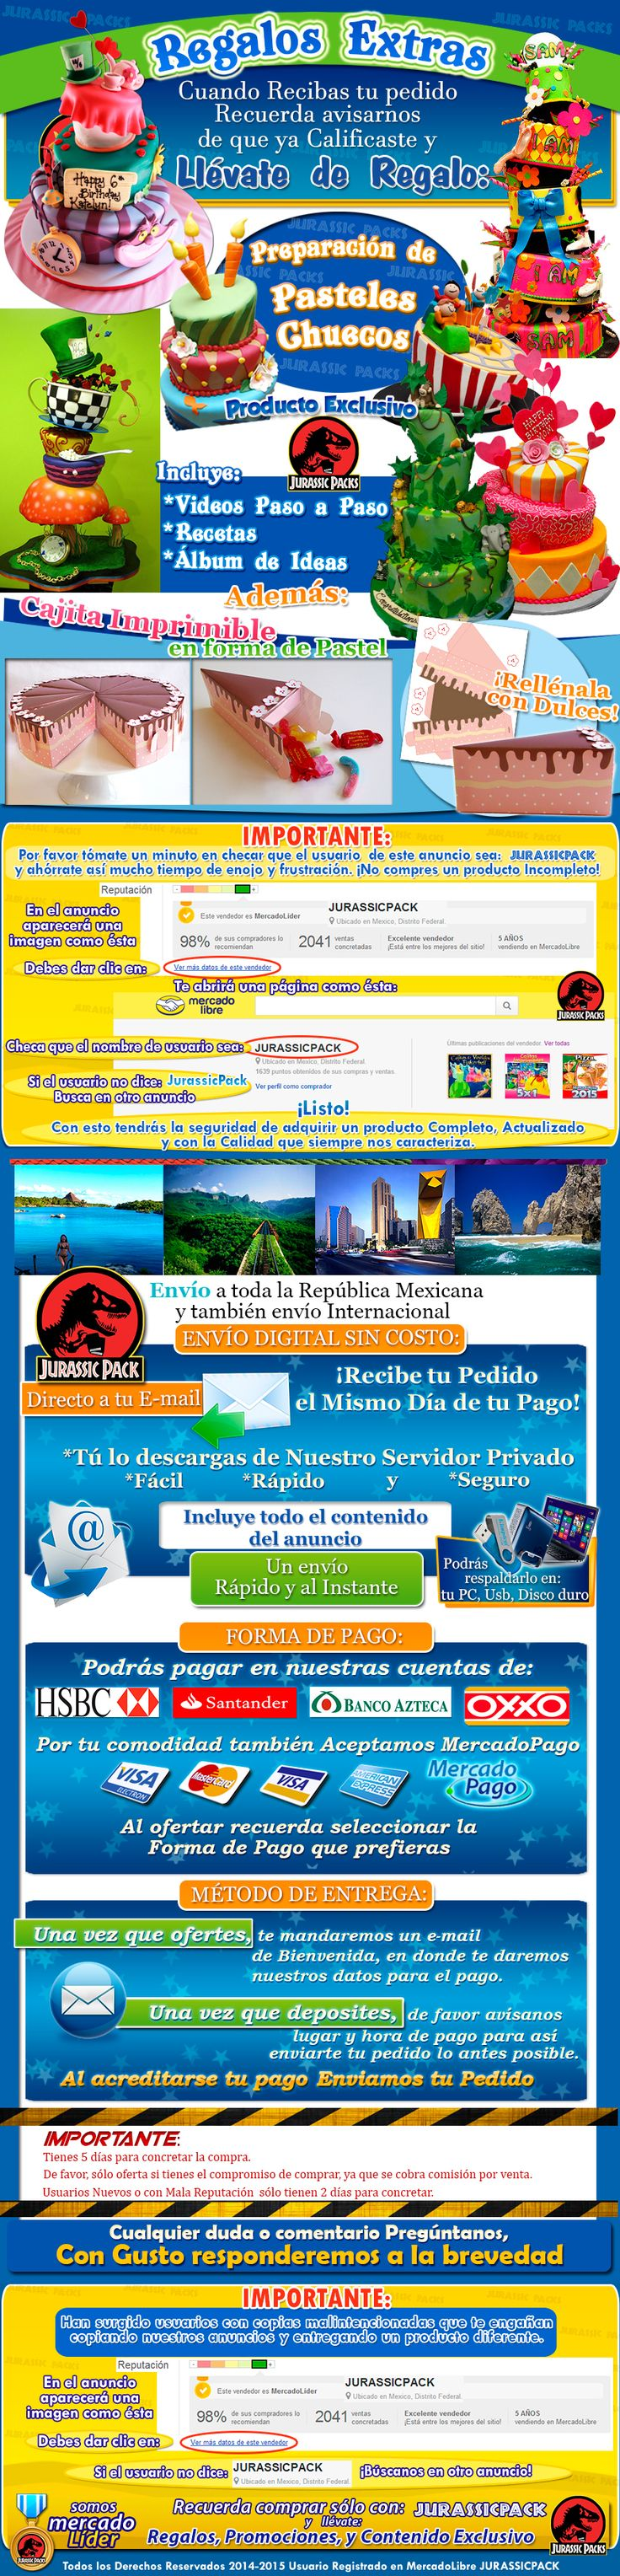 Mega Pack De Pasteles Fondant, Pasteles Chuecos Recetas - $ 99.00 en MercadoLibre